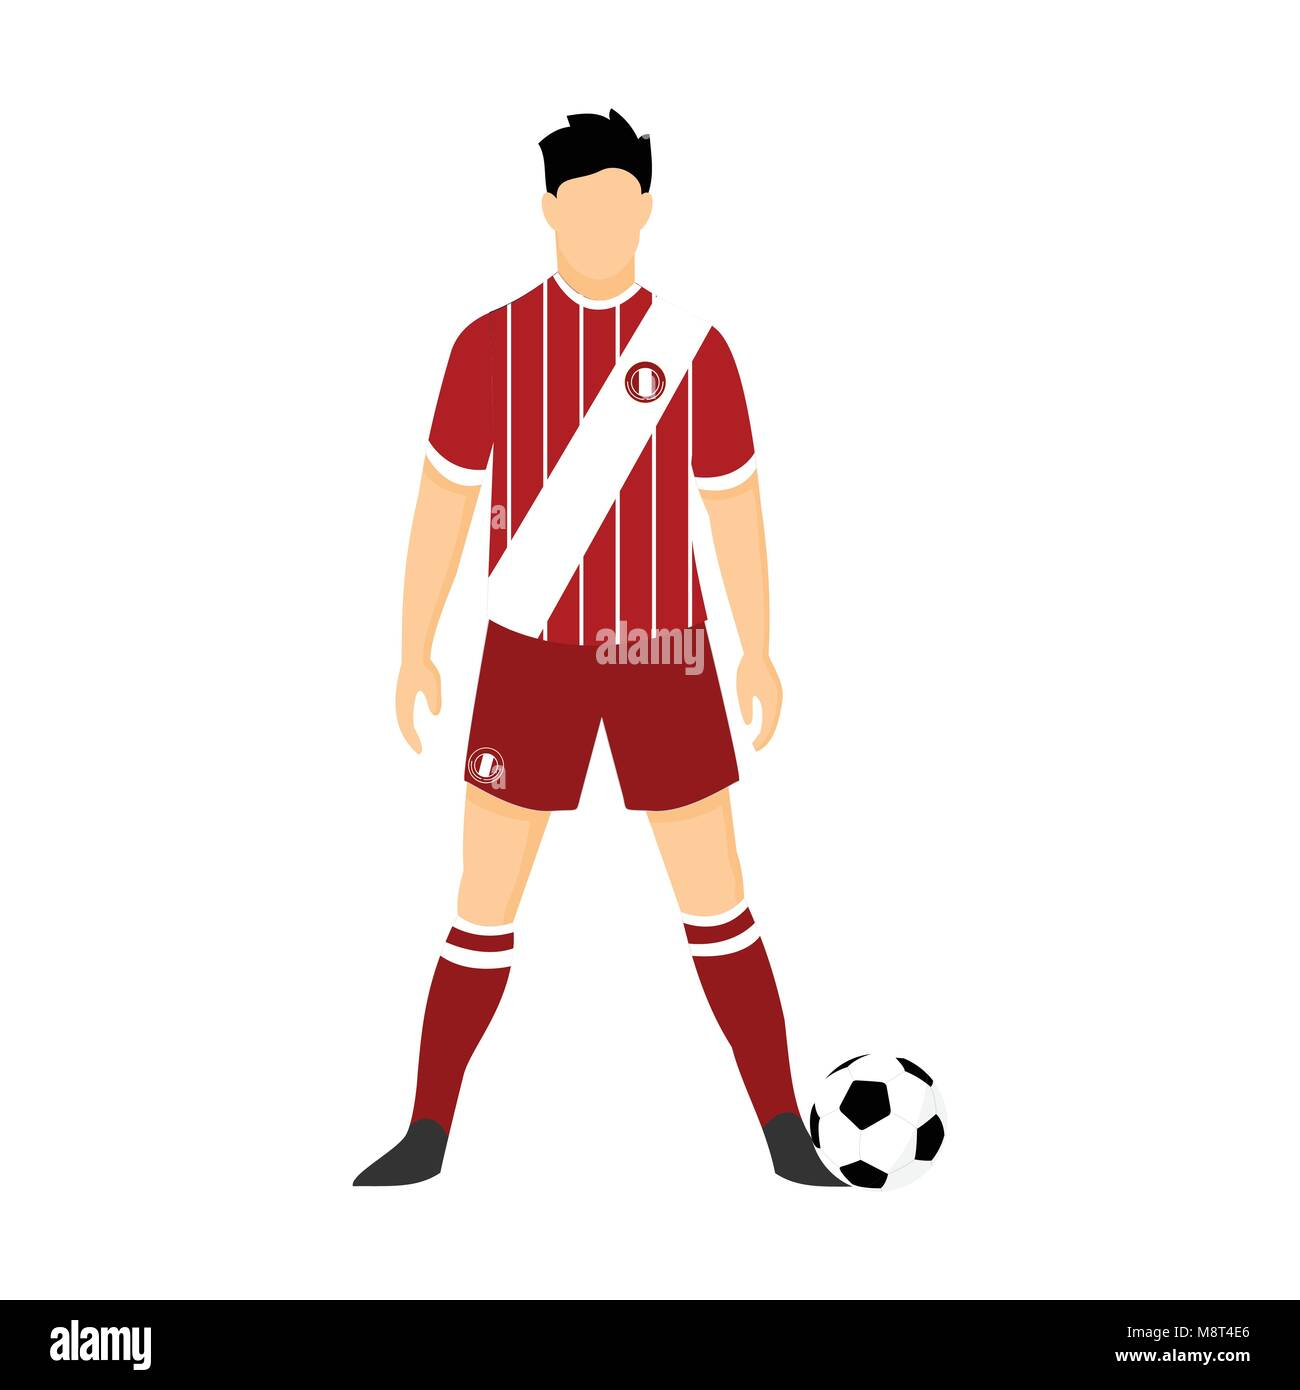 f3c36c929fb Peru Football Uniform National Team Vector Illustration Graphic Design -  Stock Vector